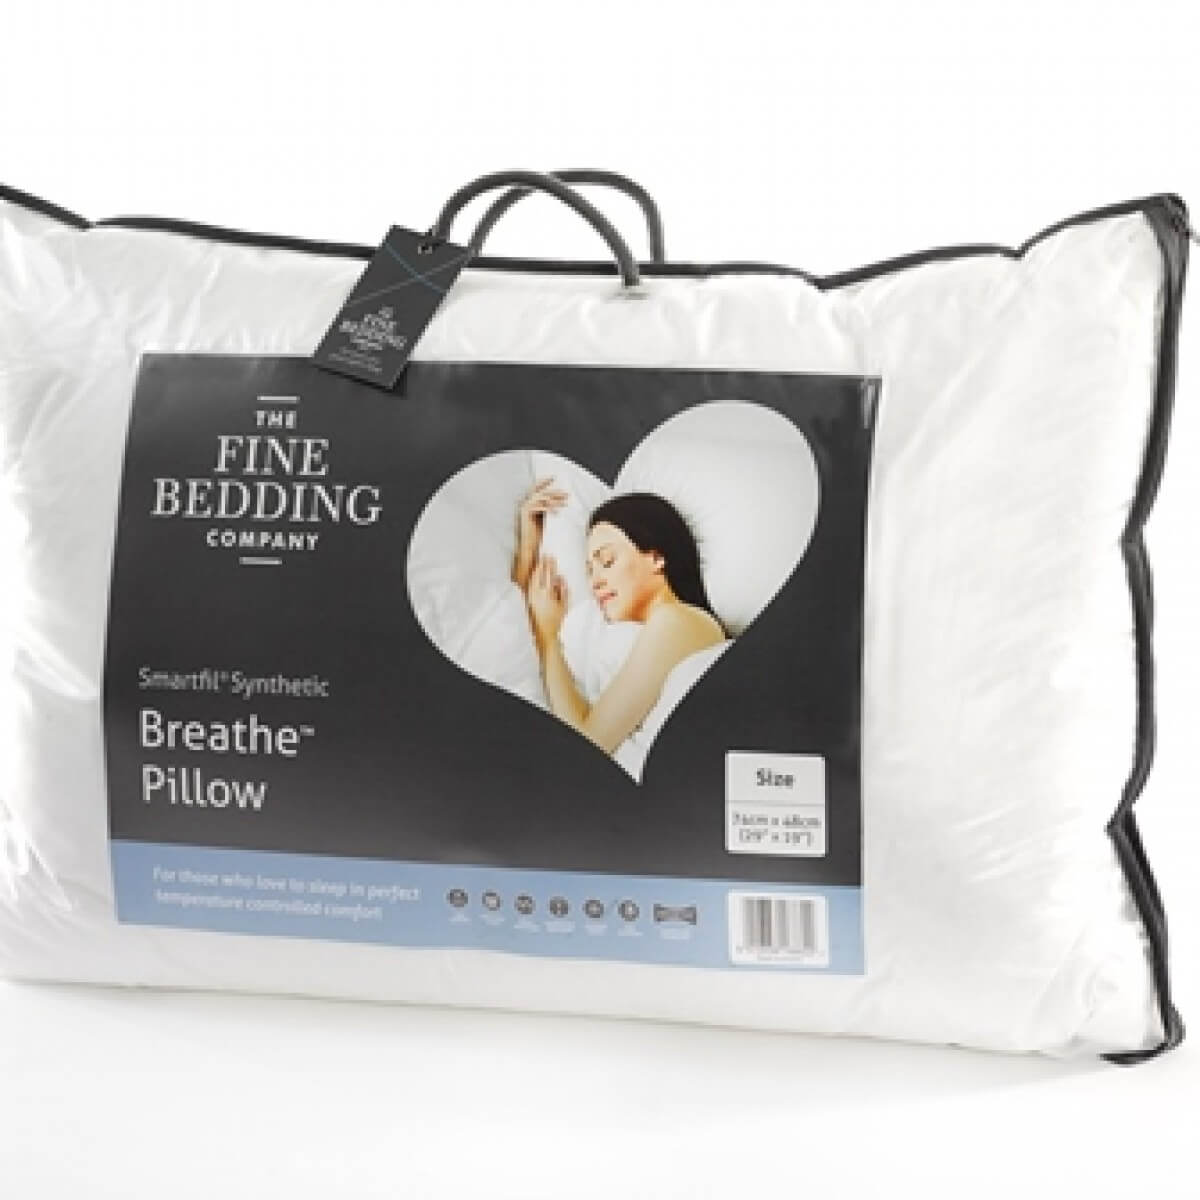 Breathe Pillow - The Fine Bedding Company